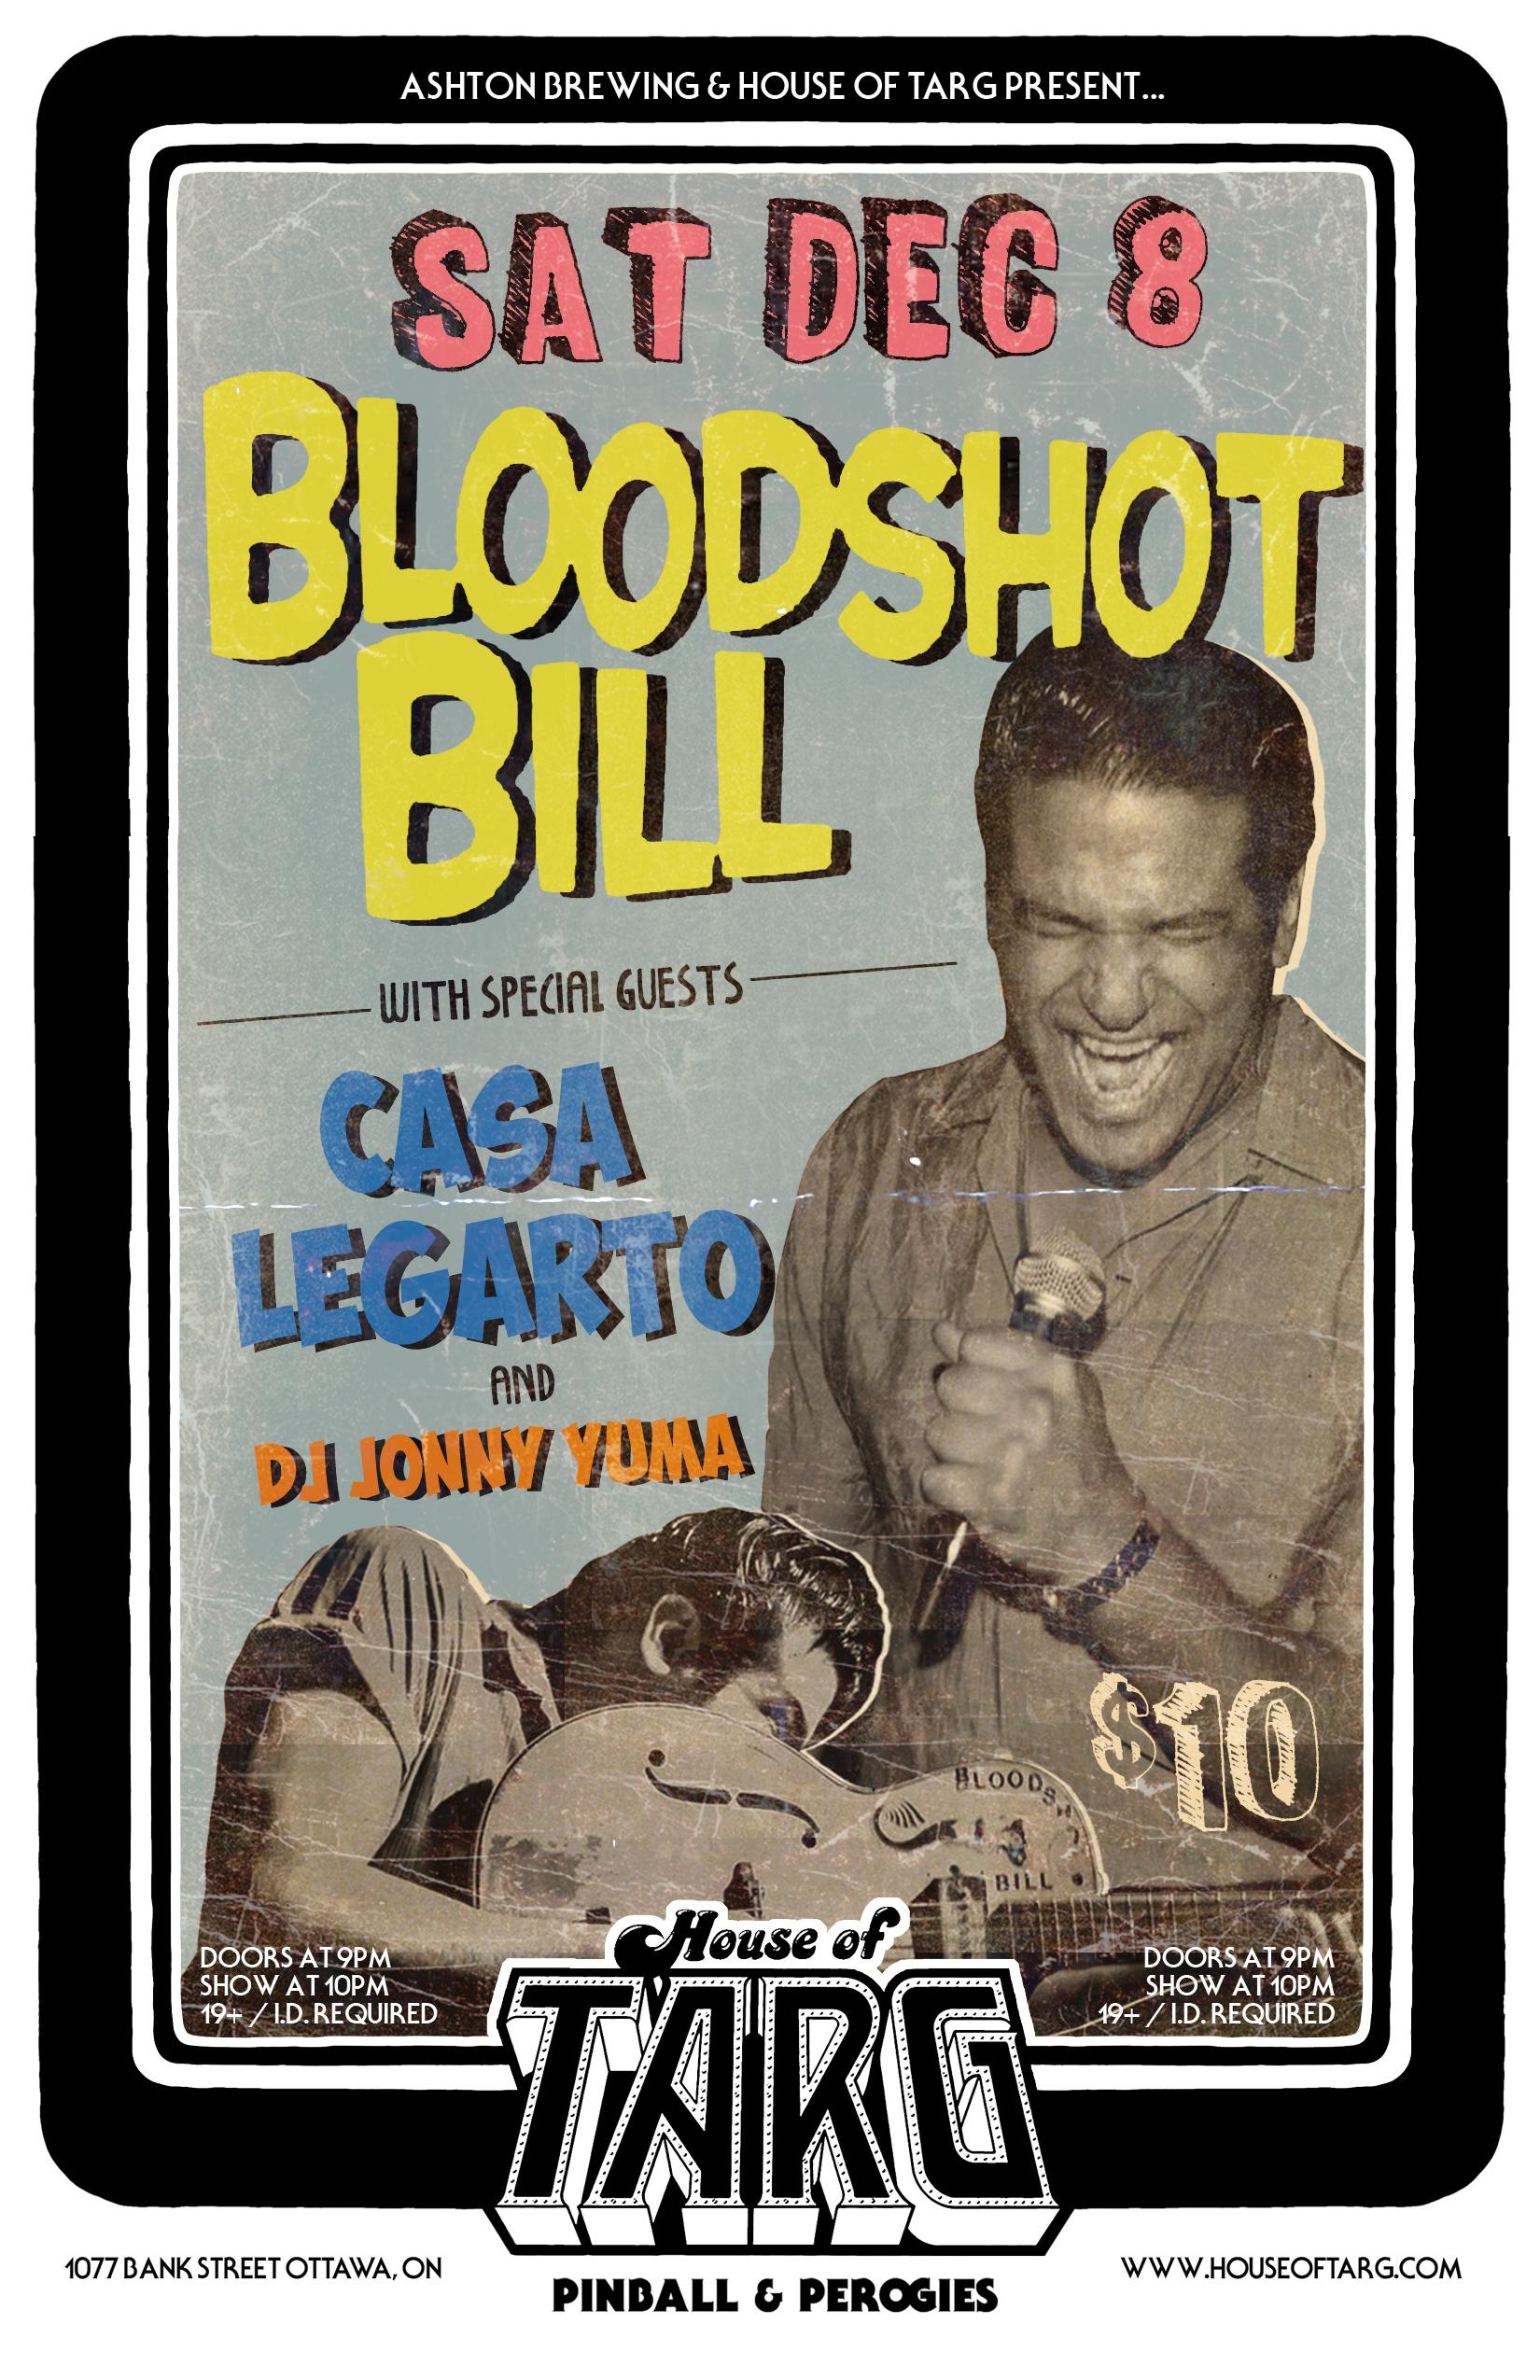 Bloodshot Bill Sat Dec 8.jpg